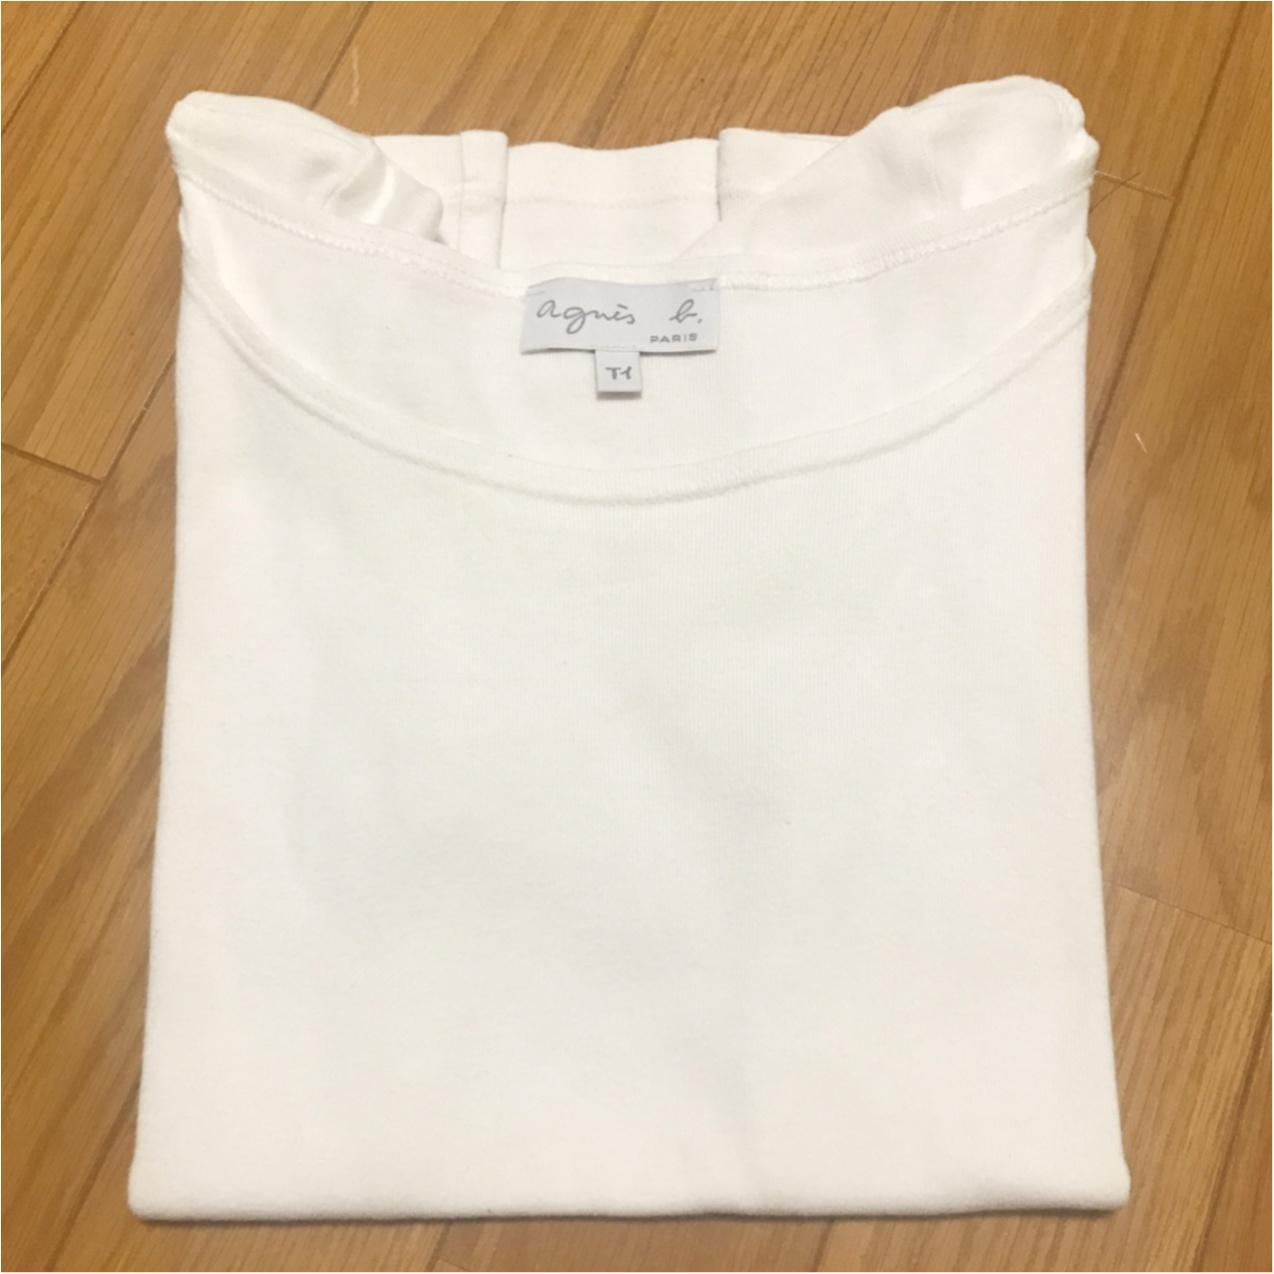 【agnes b.】きれいめにもカジュアルにも。一生モノの《白Tシャツ》!_3